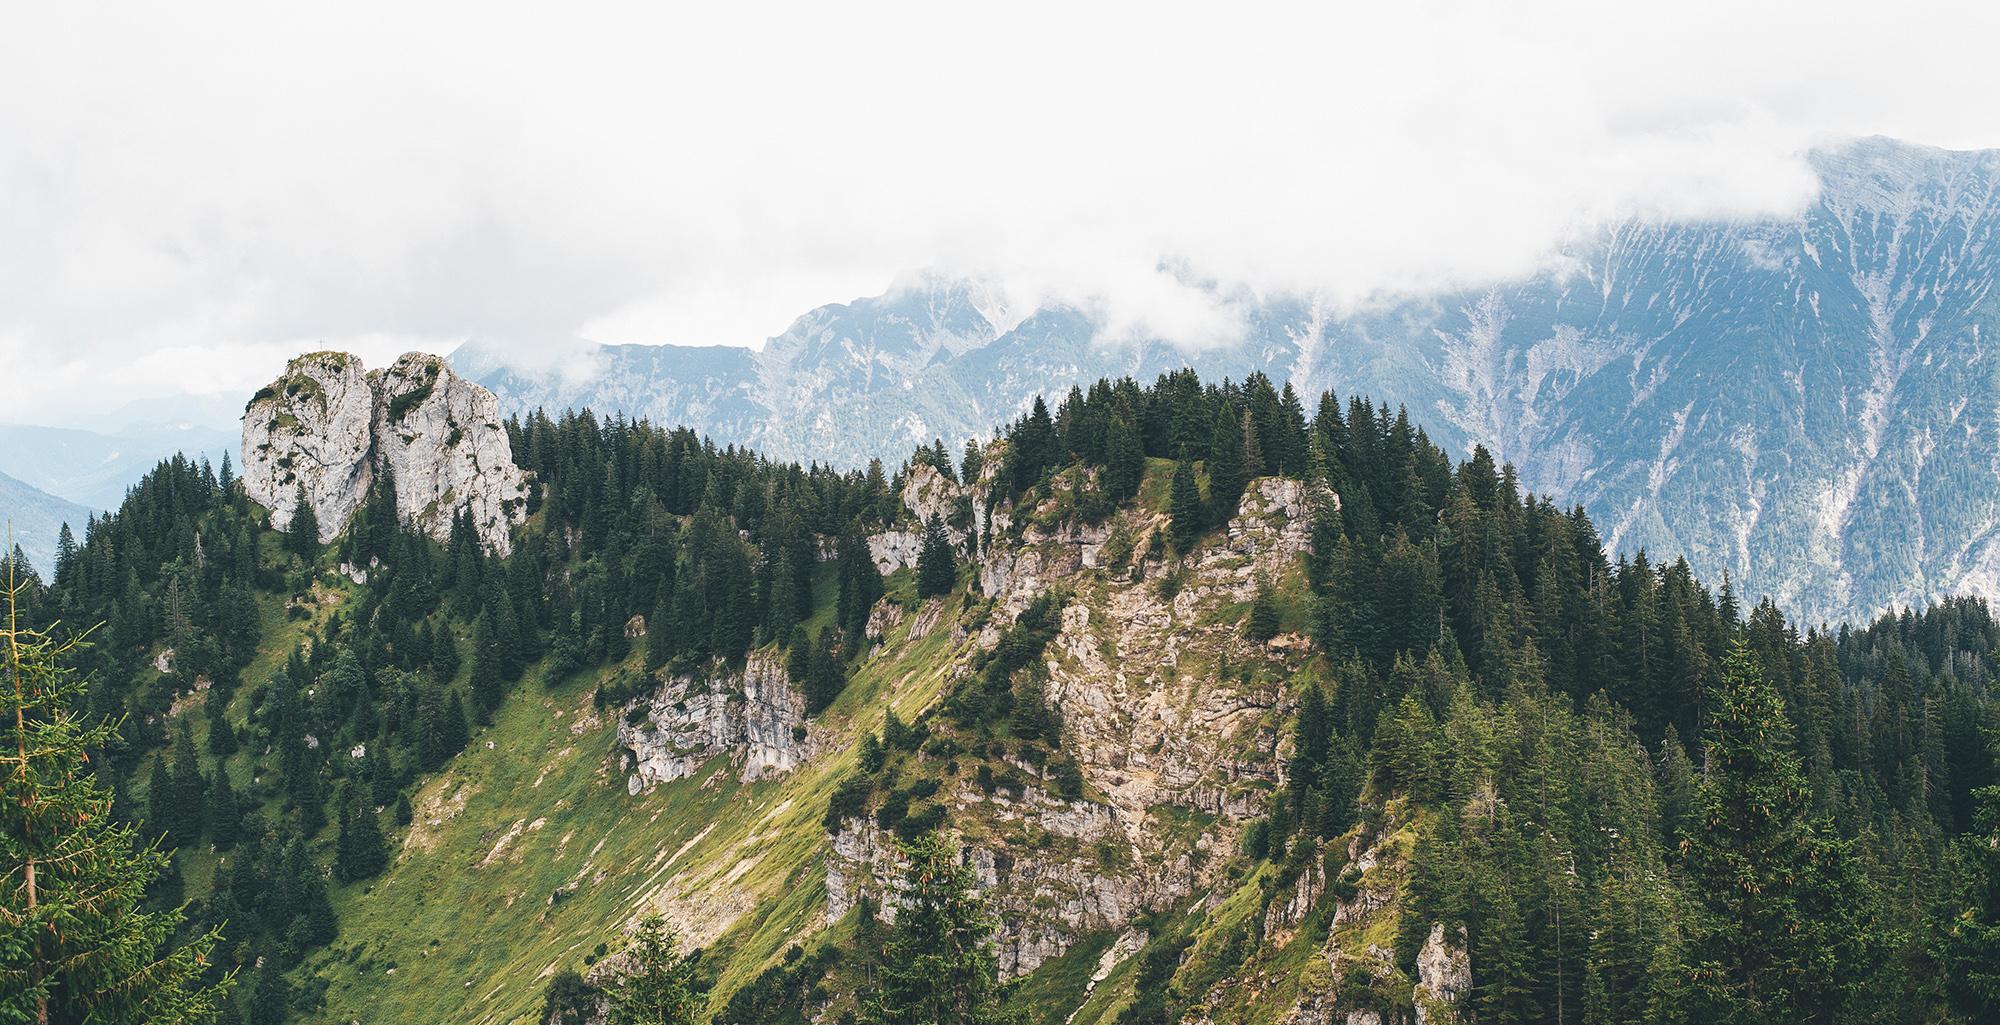 Oberammergau, Germany by markus-spiske